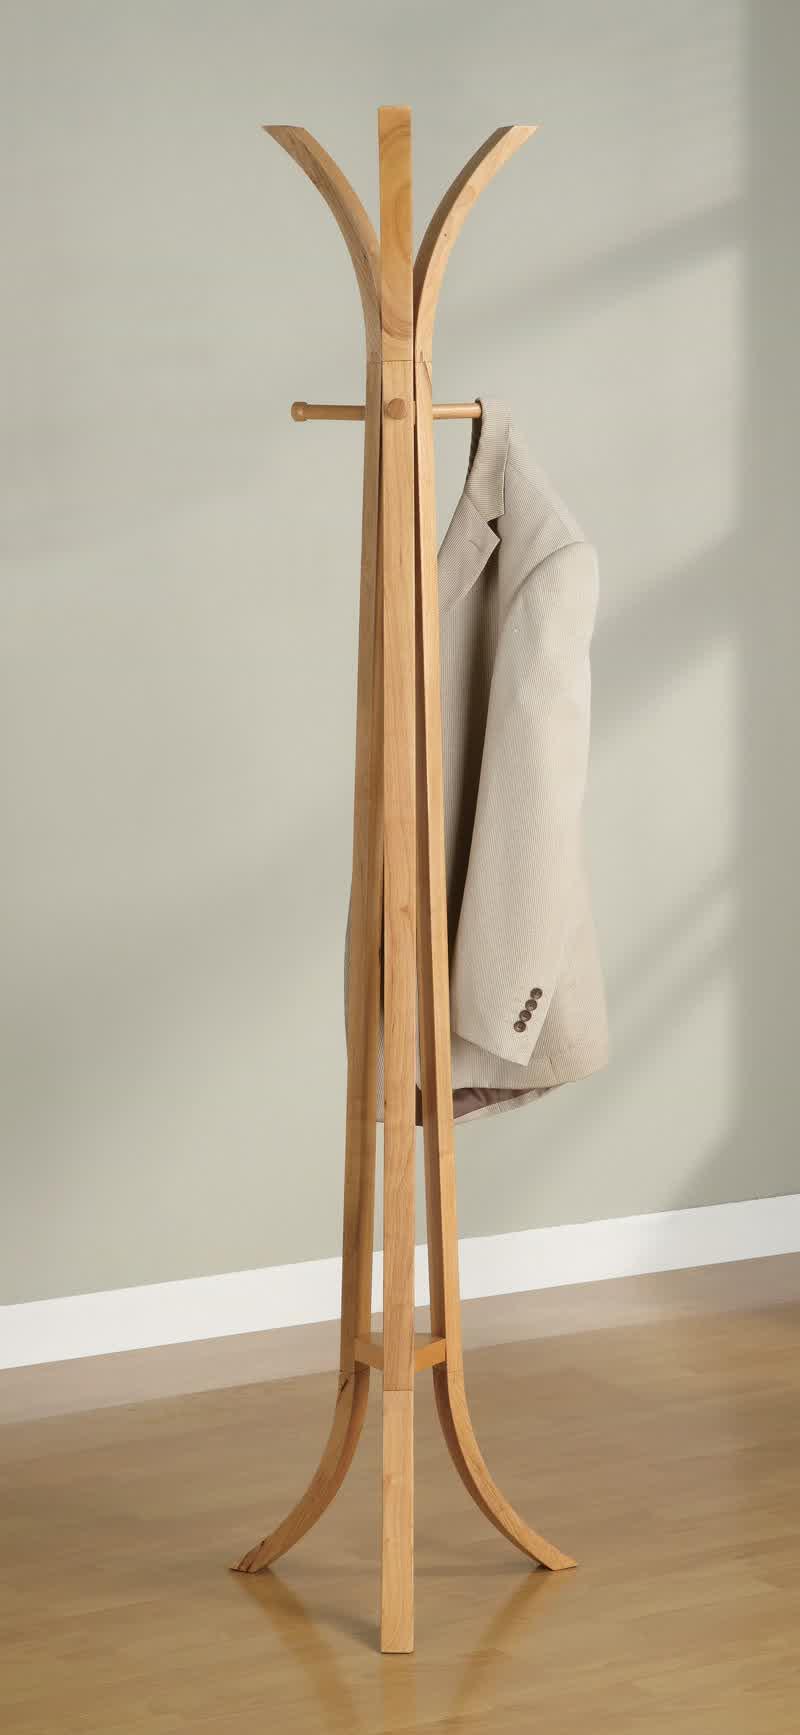 Standing Coat Hanger Smart Solution For Organizing Your